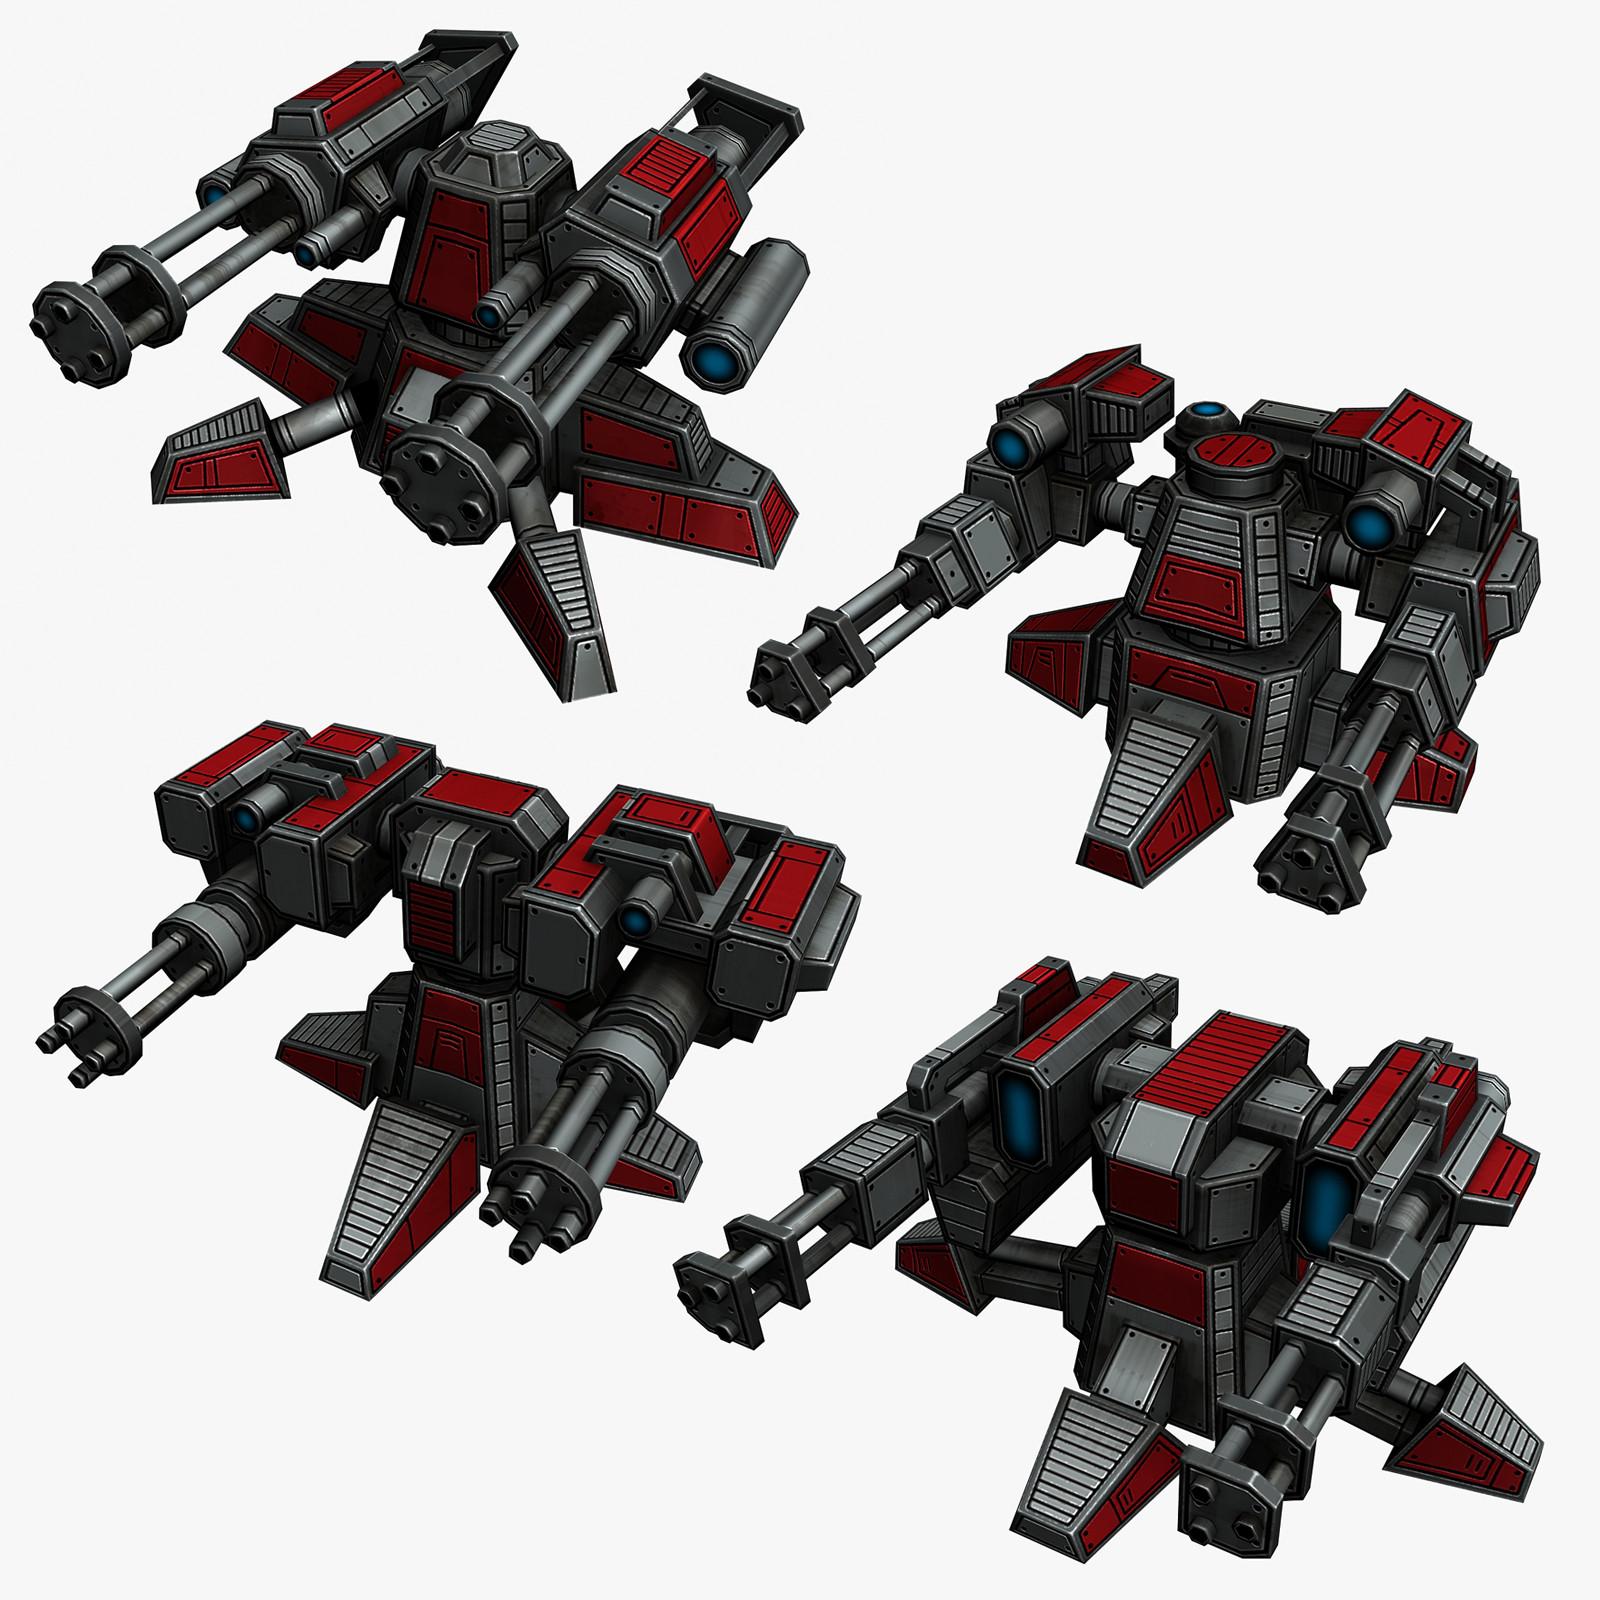 4_sci_fi_mini_guns_preview.jpg